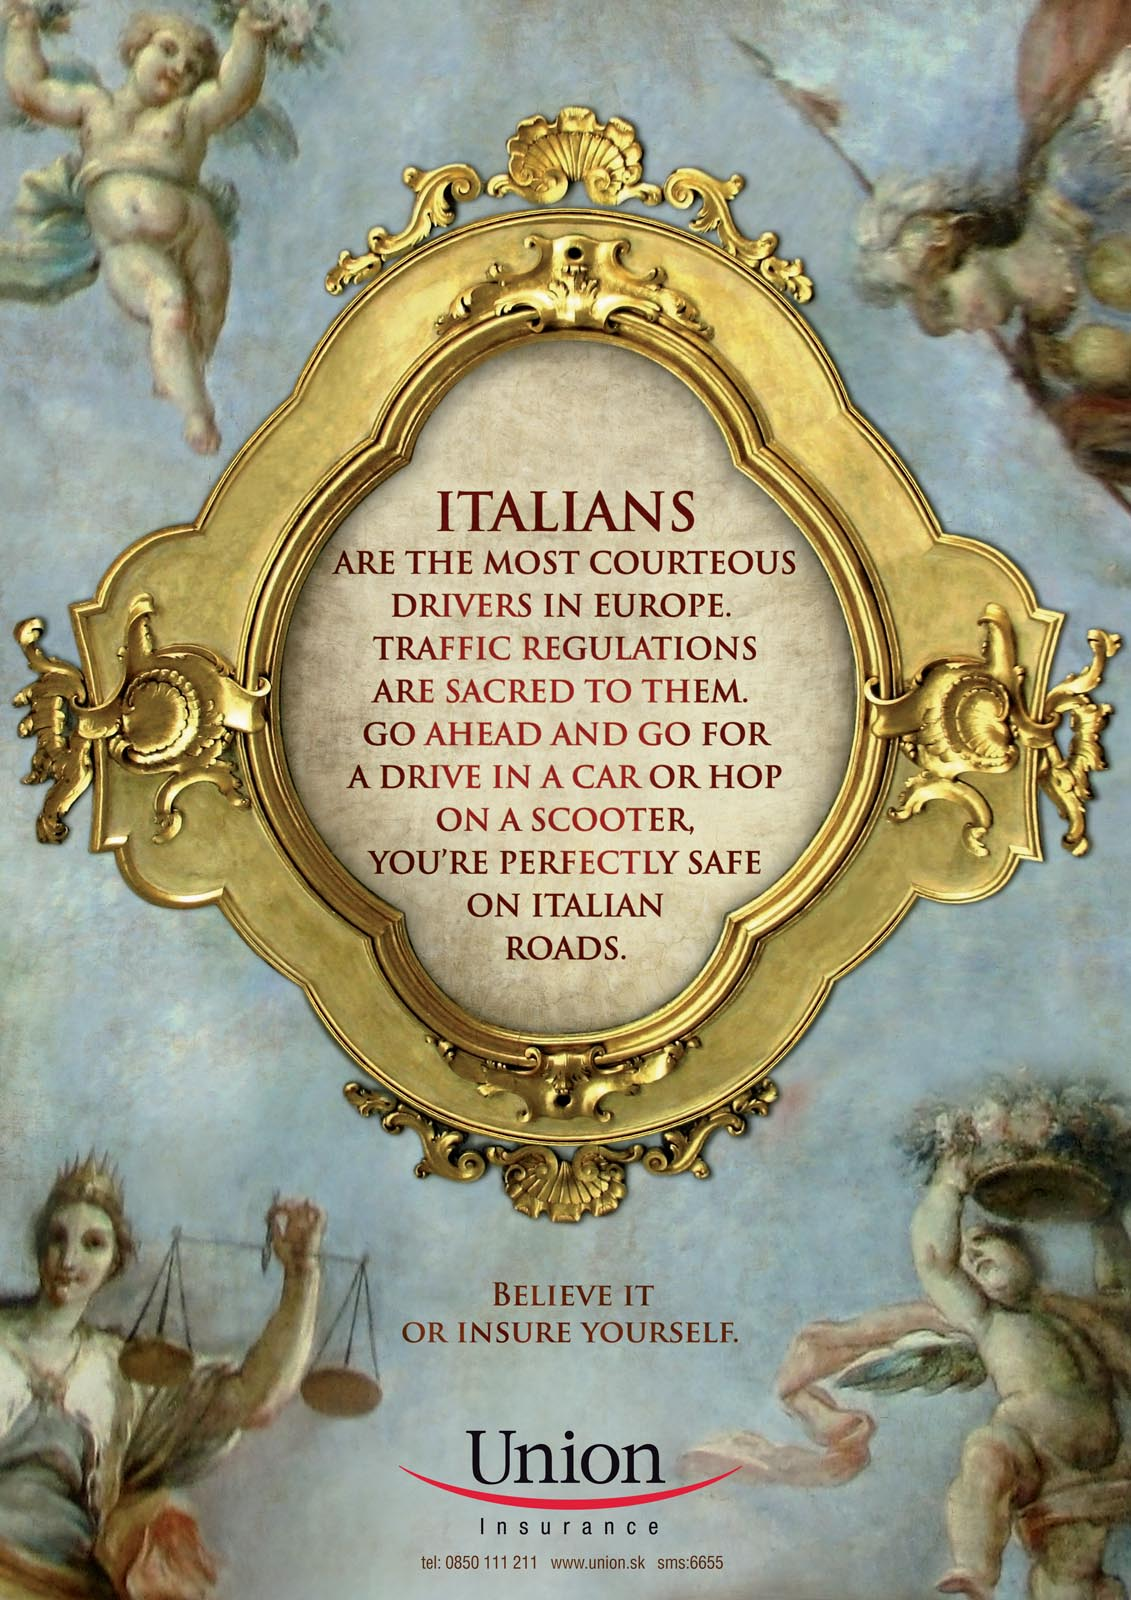 Union Insurance_Italy_1 (AoTW)